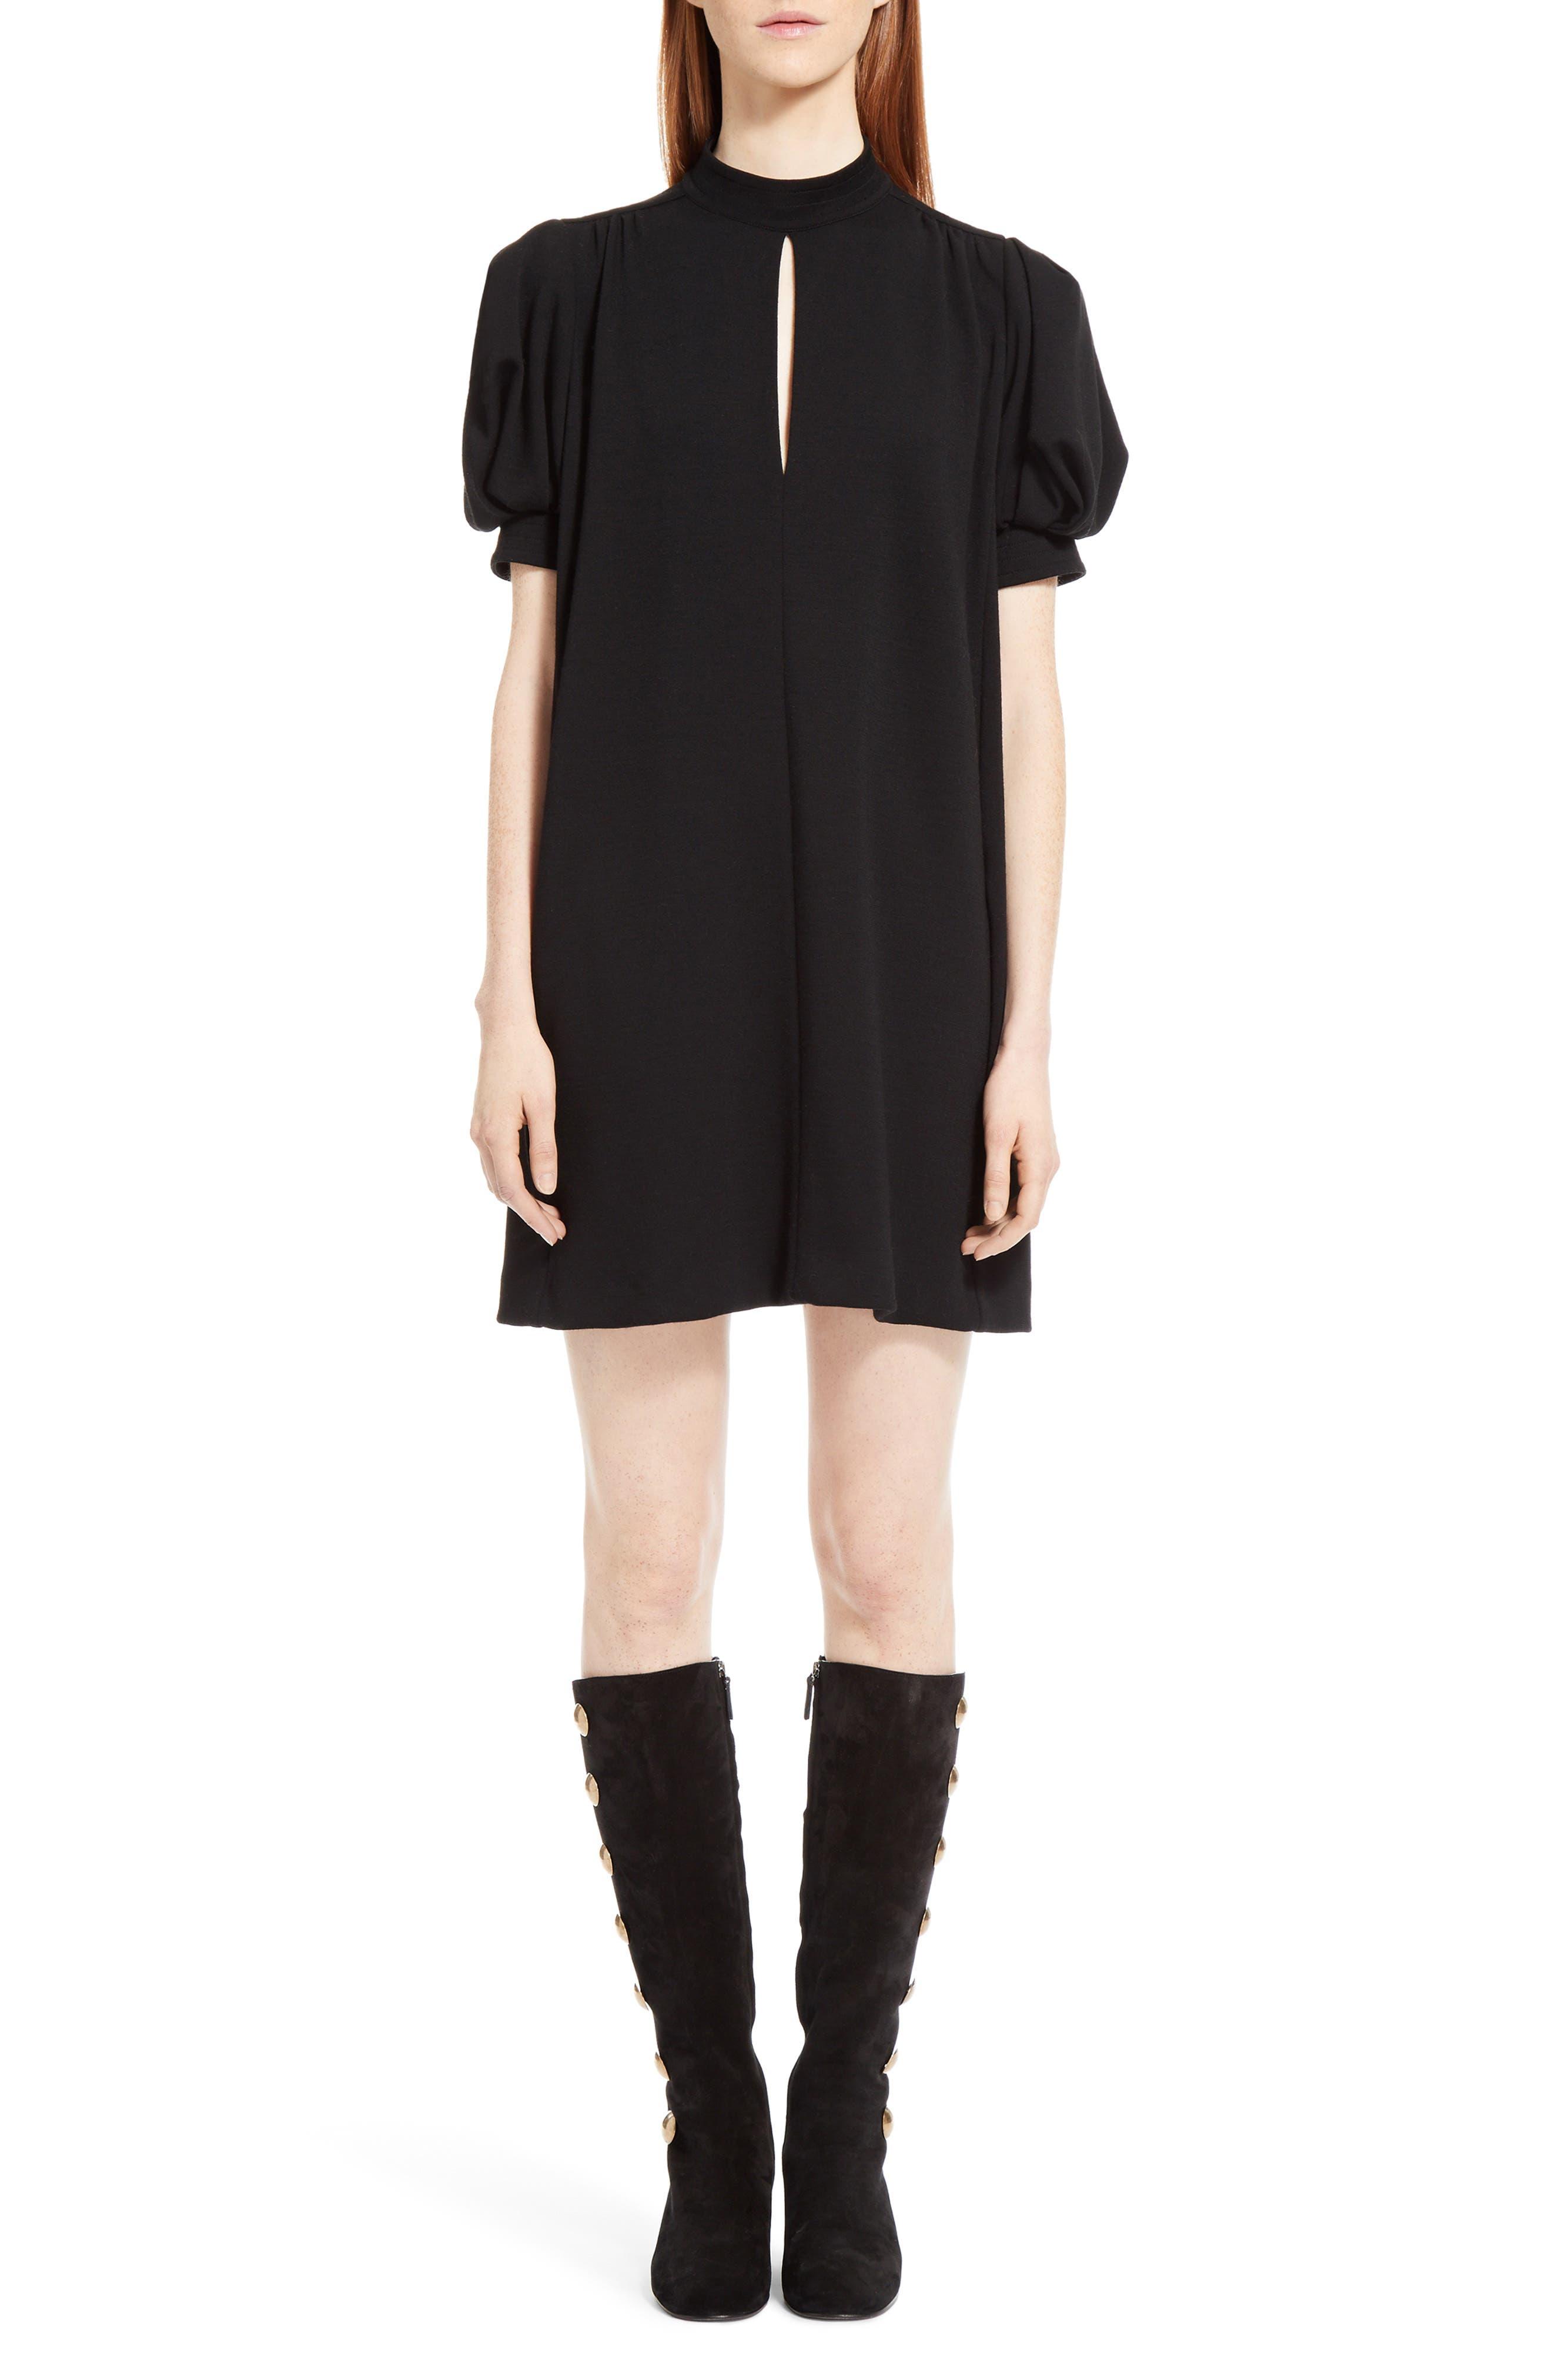 Chloé Wool Jersey Dress